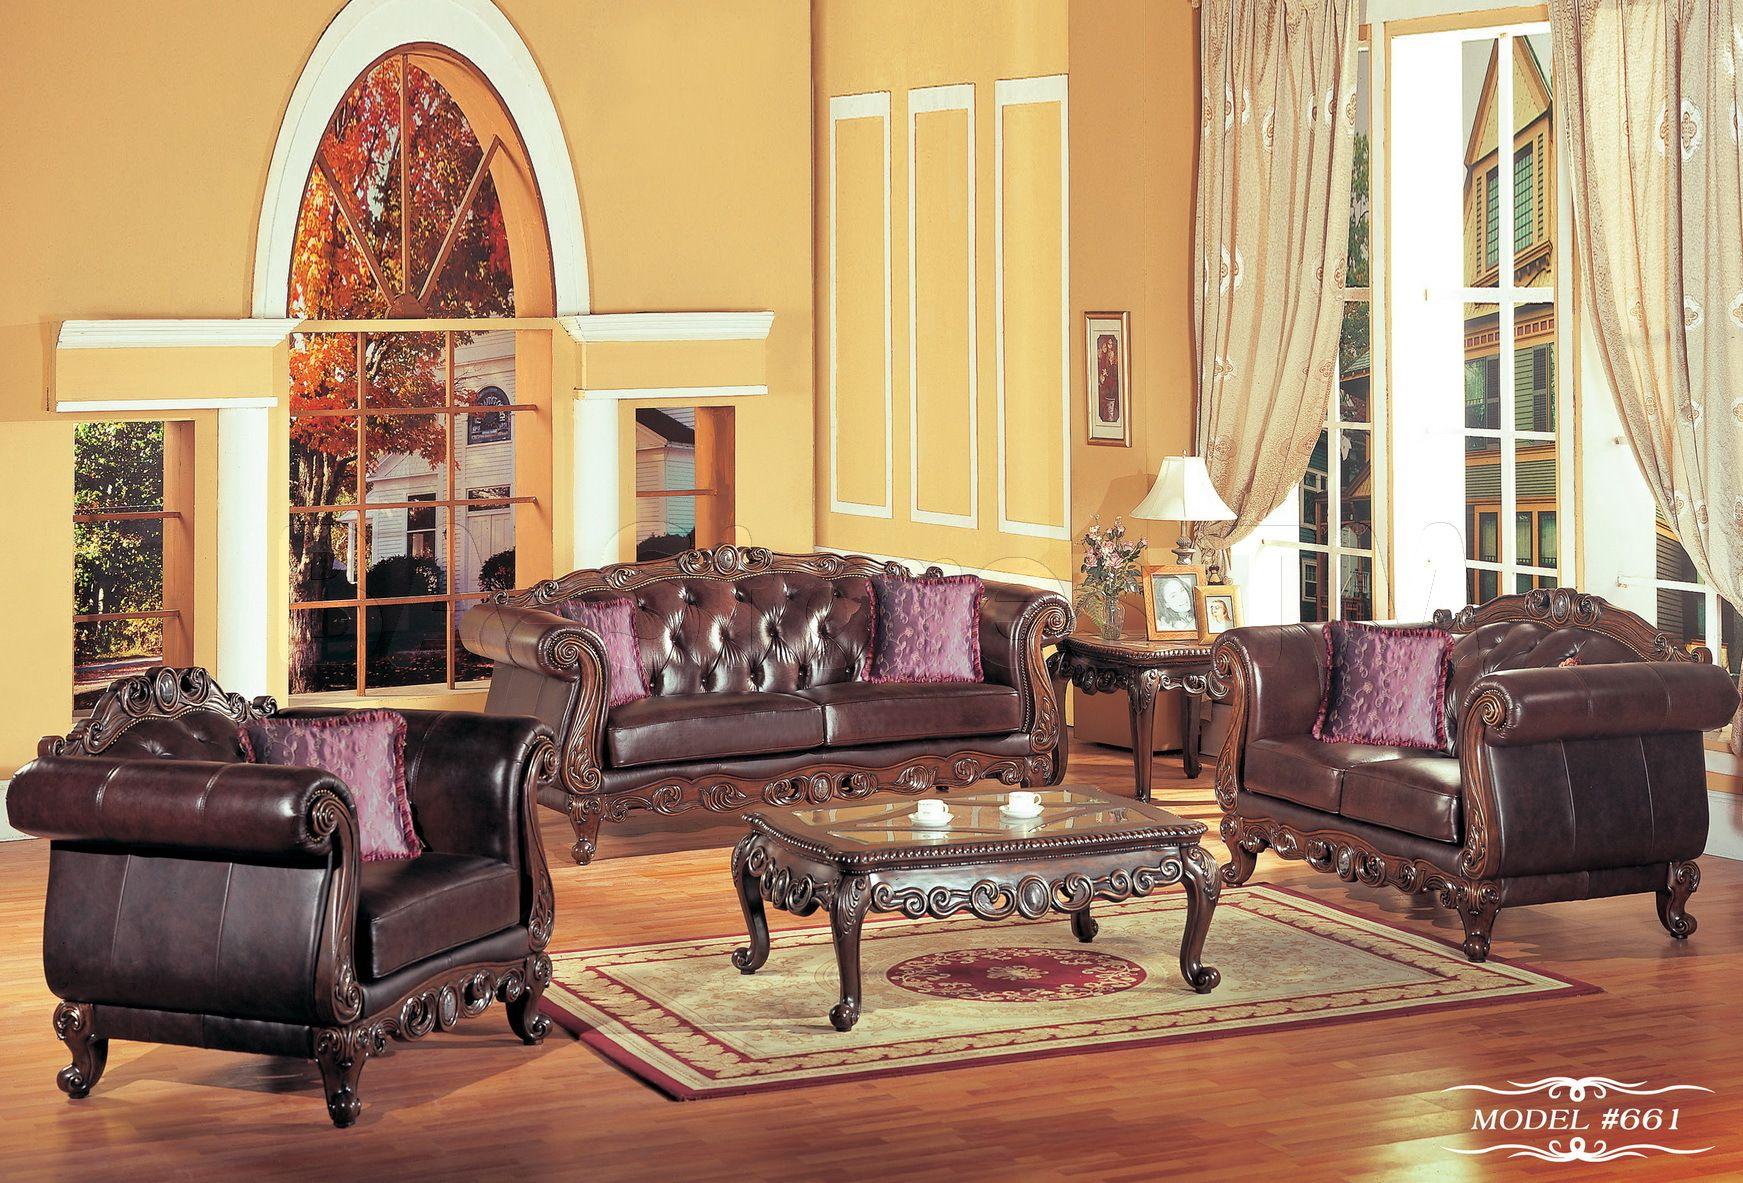 Settee Furniture  Google Search  Victorian Decor  Pinterest Captivating Traditional Living Room Furniture Design Inspiration